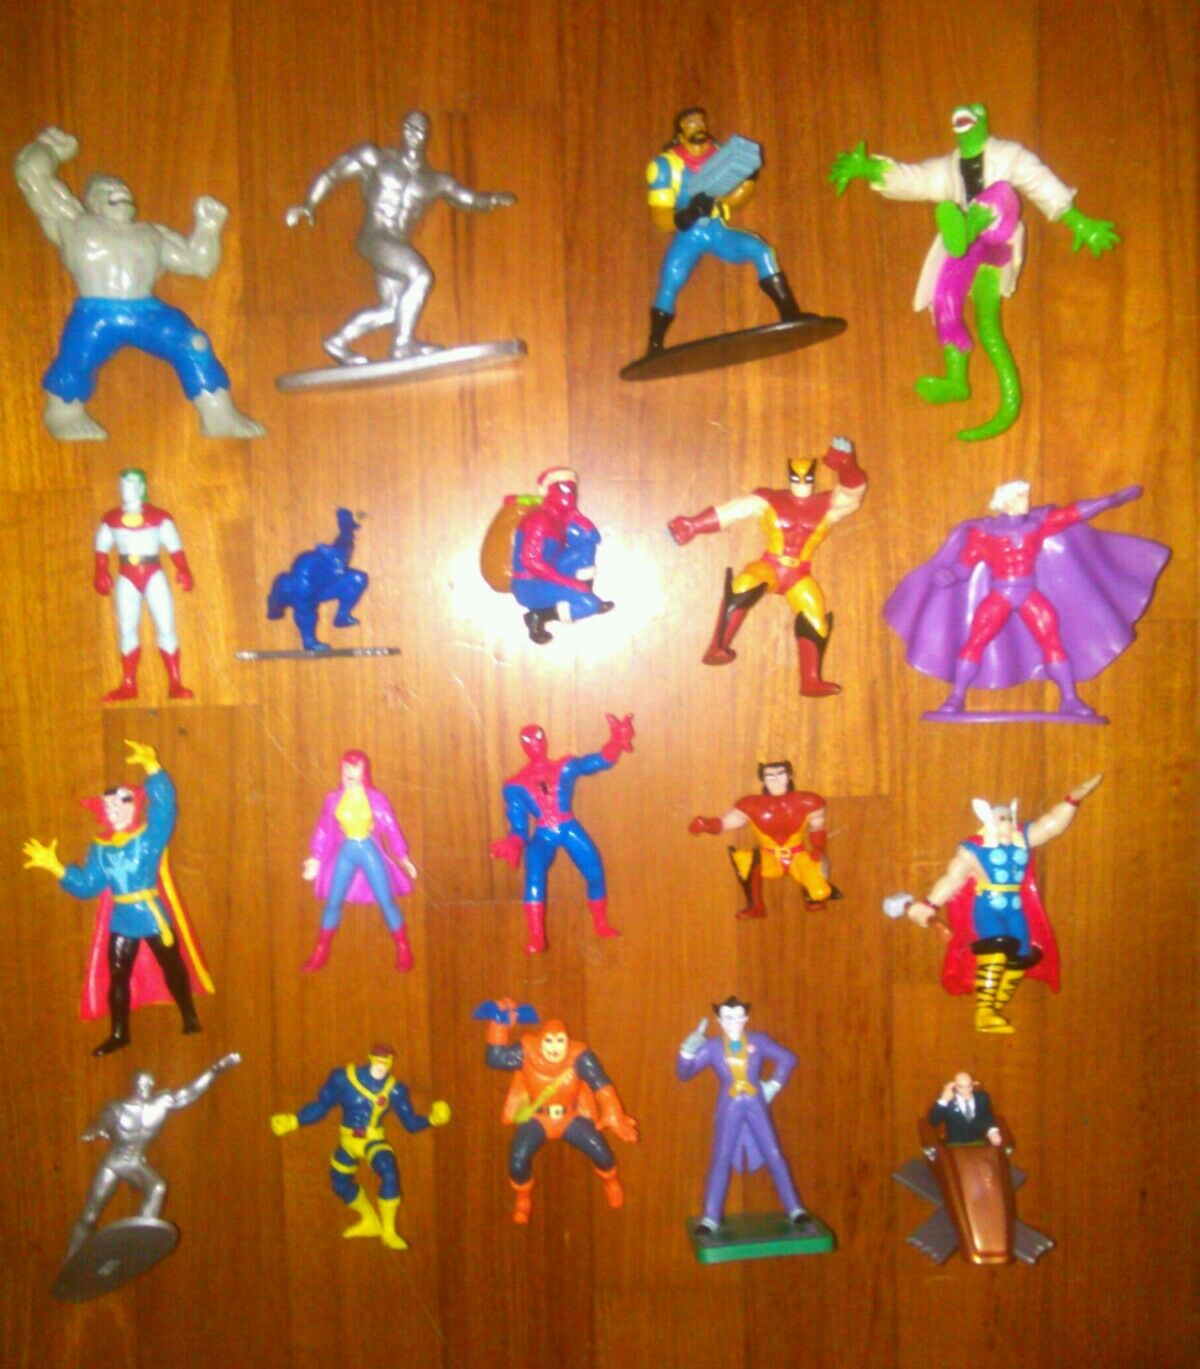 Lot AVENGERS pvc figure figurine MARVEL x-men batman spiderman dc comics thor +